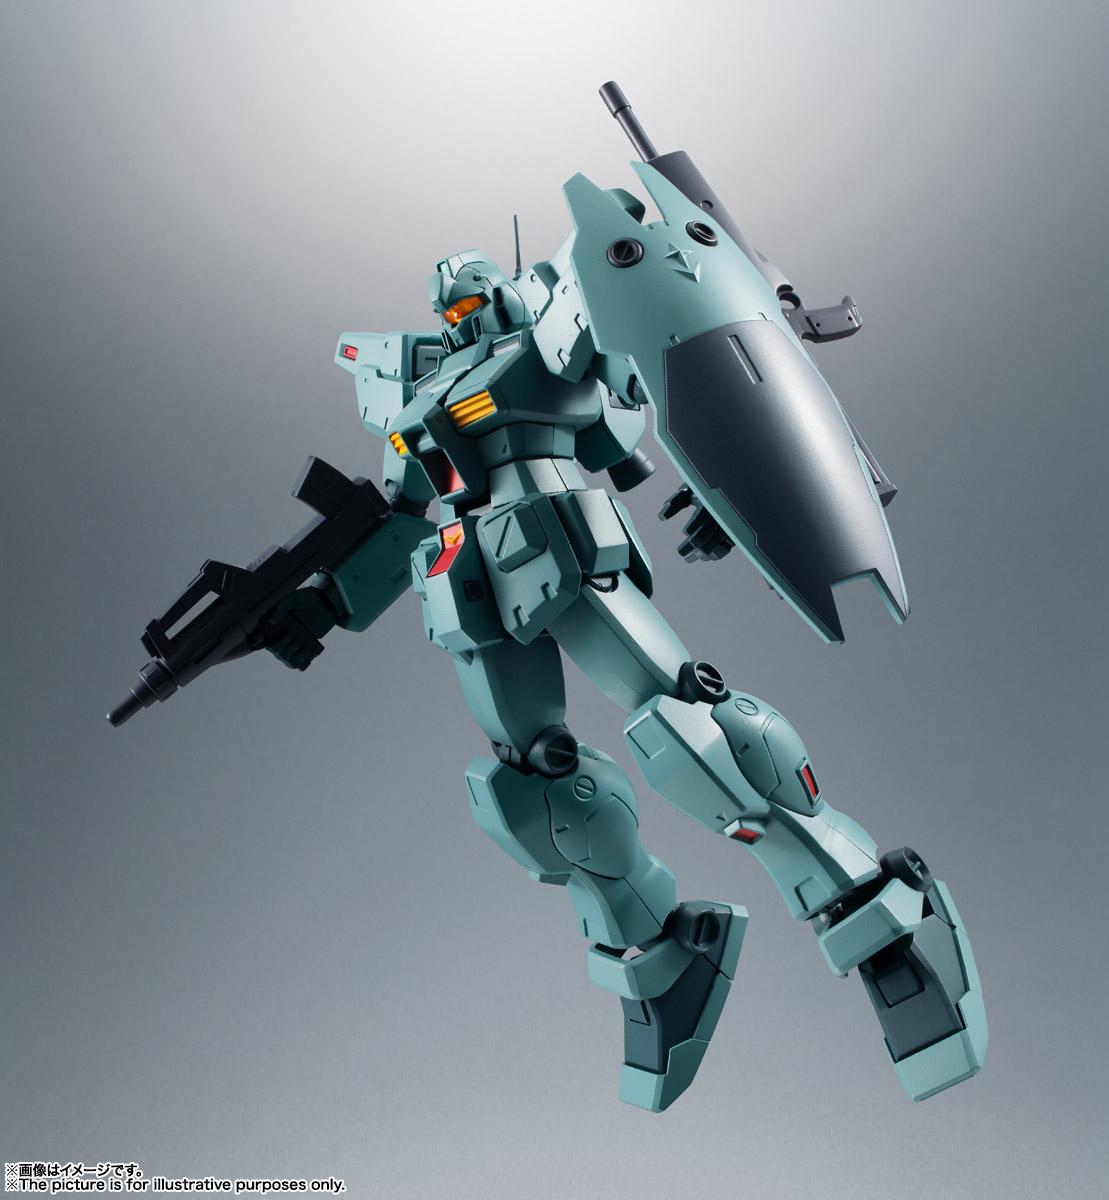 ROBOT魂〈SIDE MS〉『RGM-79N ジム・カスタム ver. A.N.I.M.E.』ガンダム0083 可動フィギュア-010